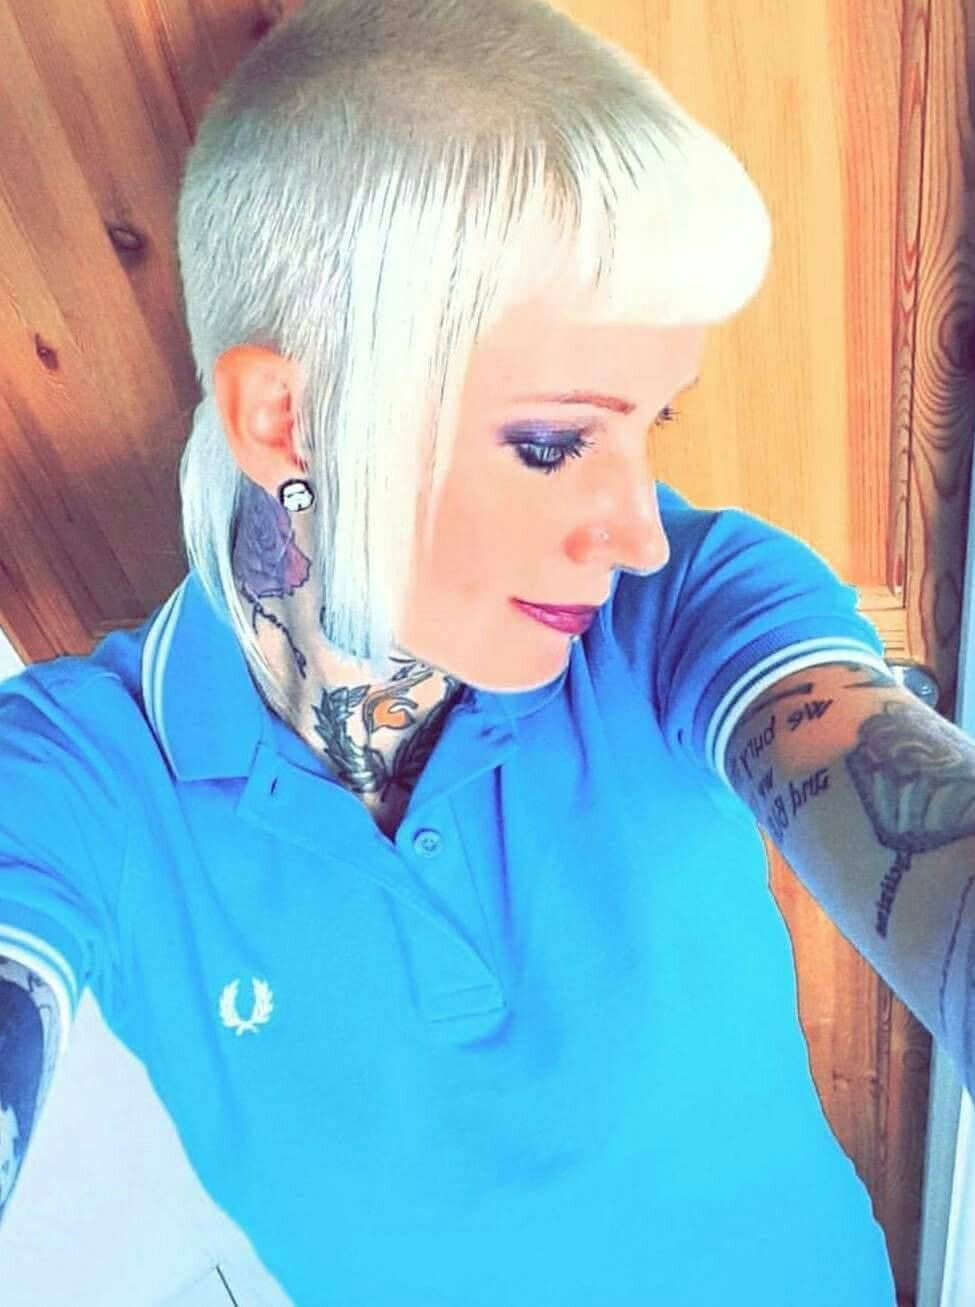 Fred Perry Girl Renees Skinhead Girl Skinhead Fashion Skinhead